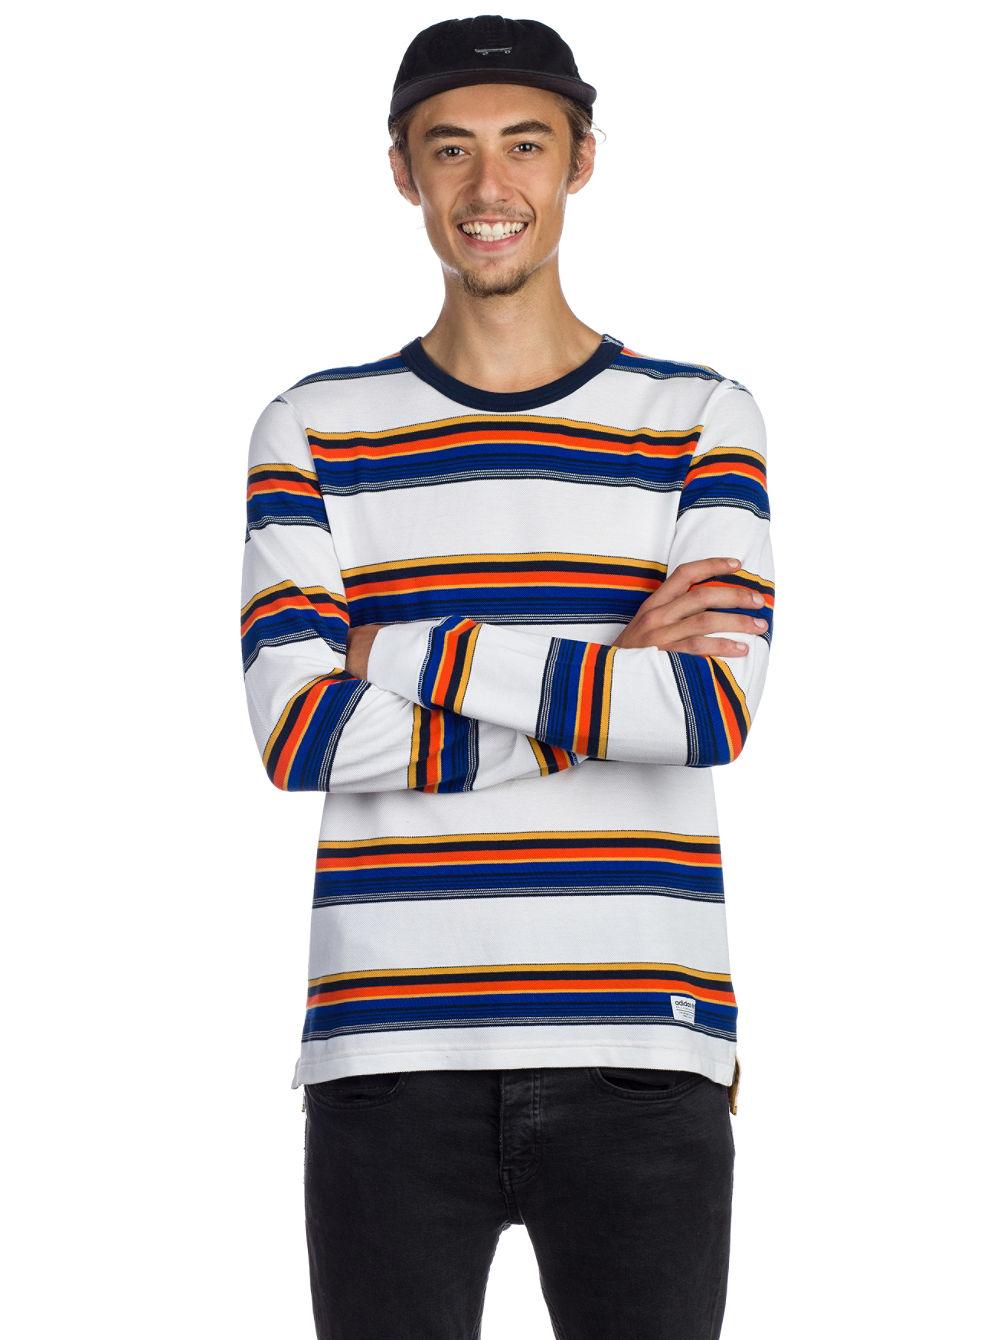 afbce25cfe0f8 Compra adidas Skateboarding Labour Yan Dye Camiseta en línea en Blue Tomato